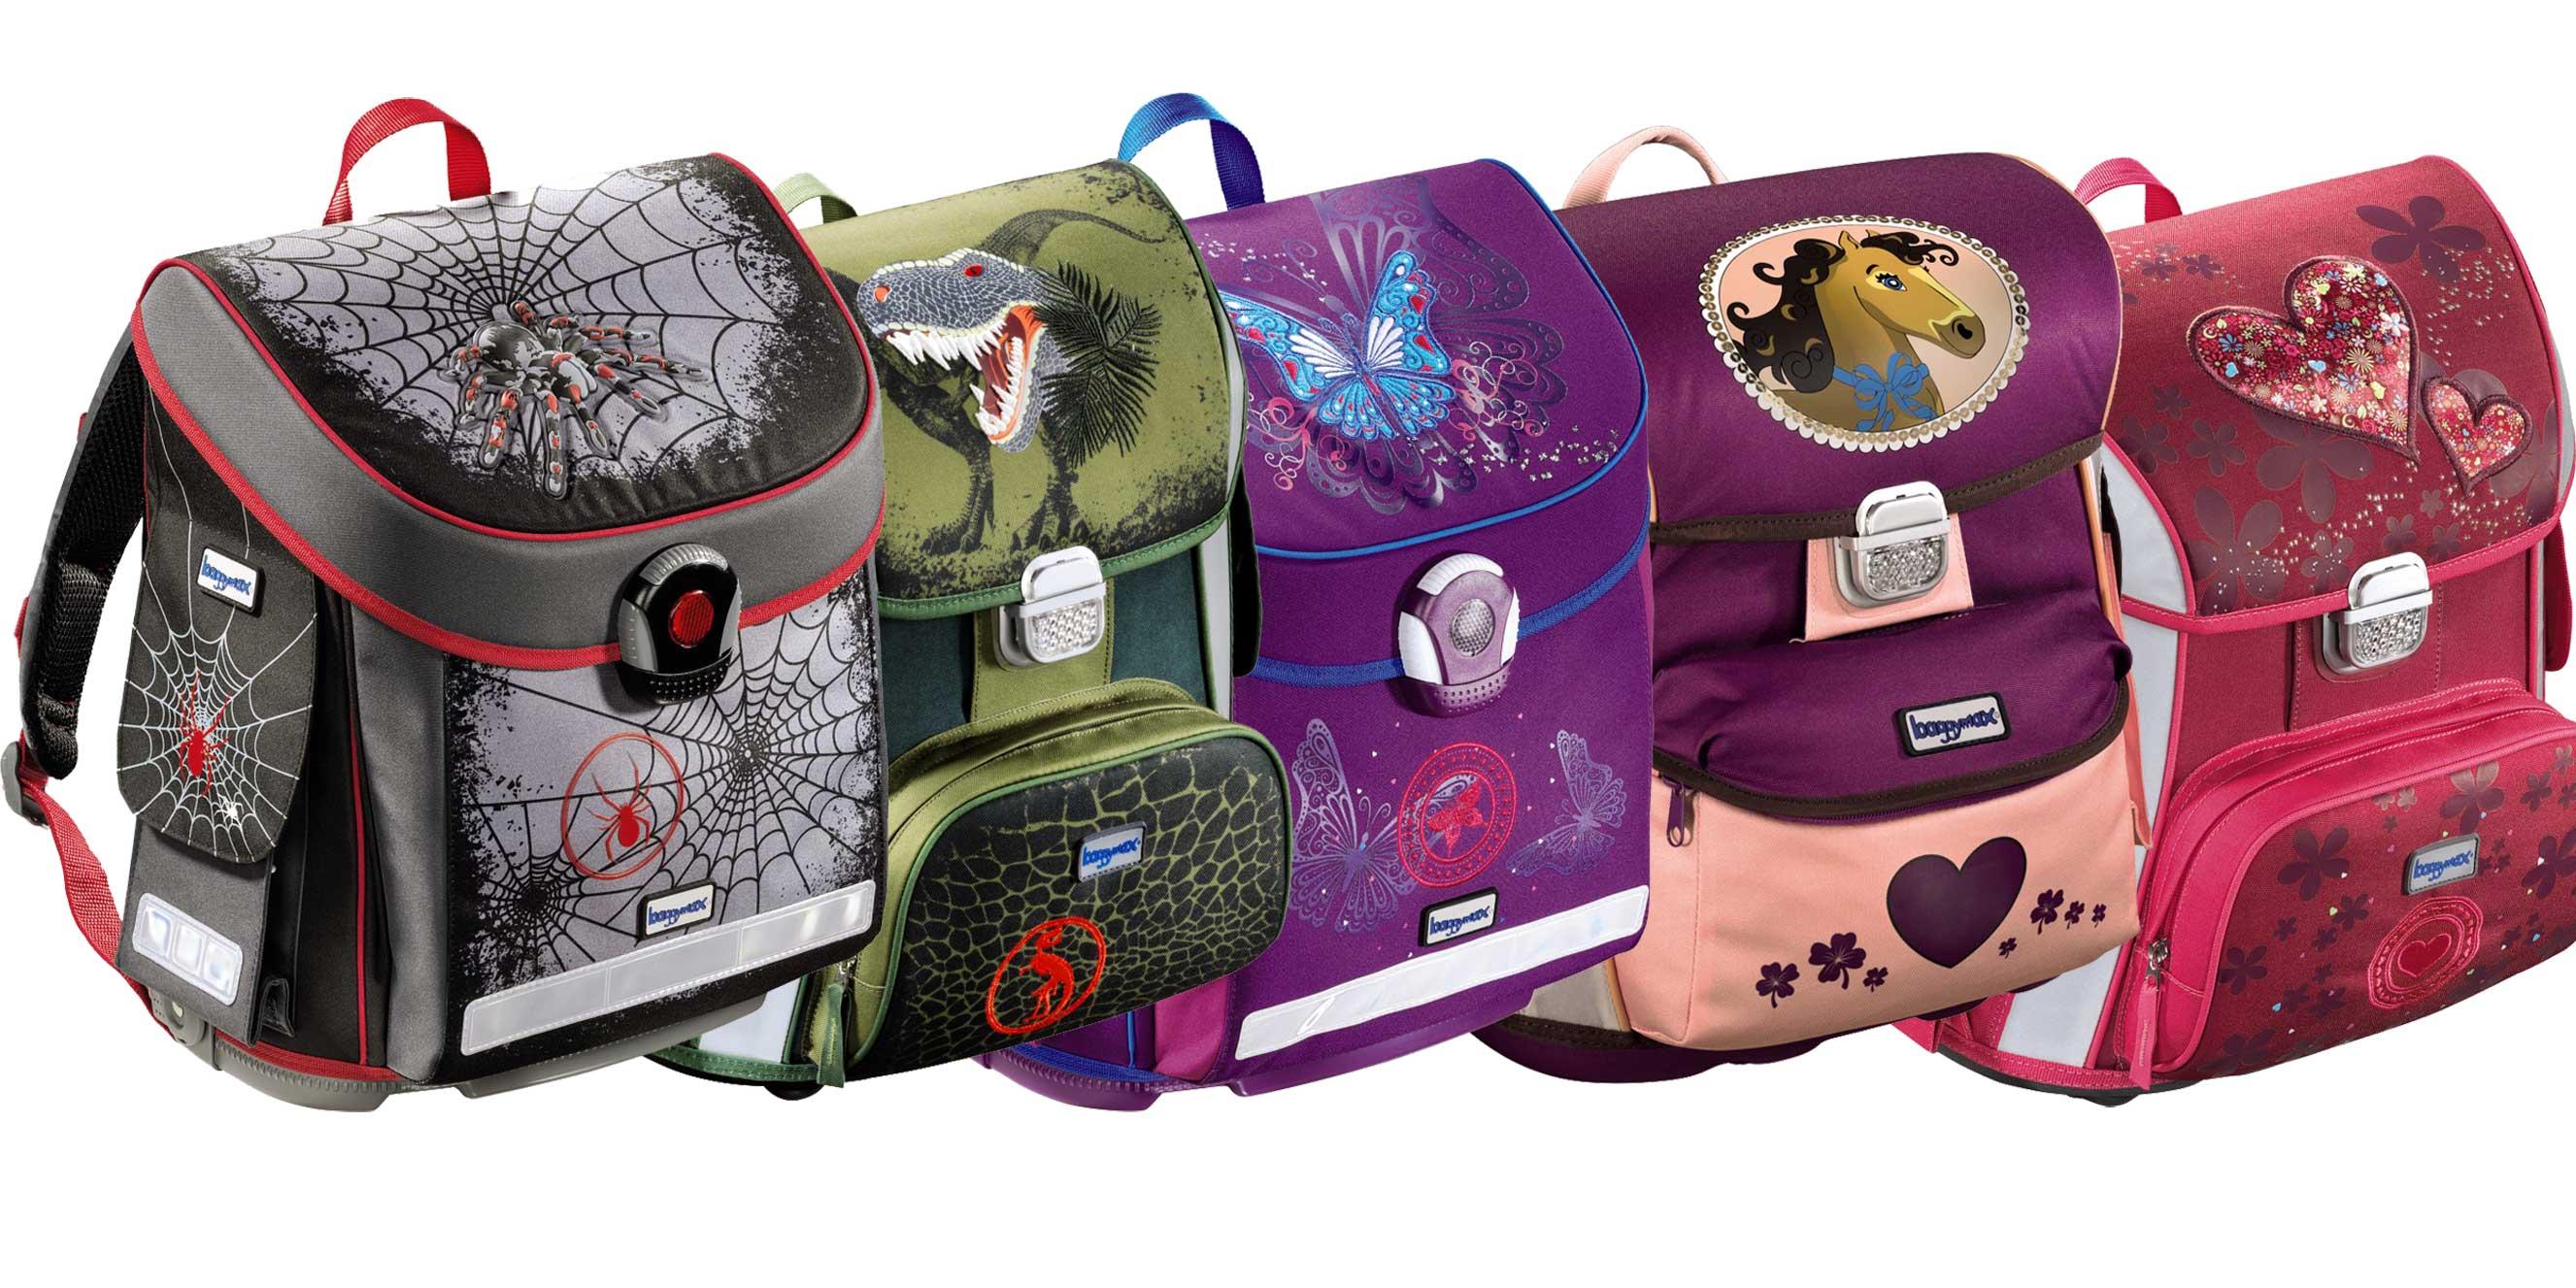 af38f66911 Školské tašky ars una online predaj e-shop